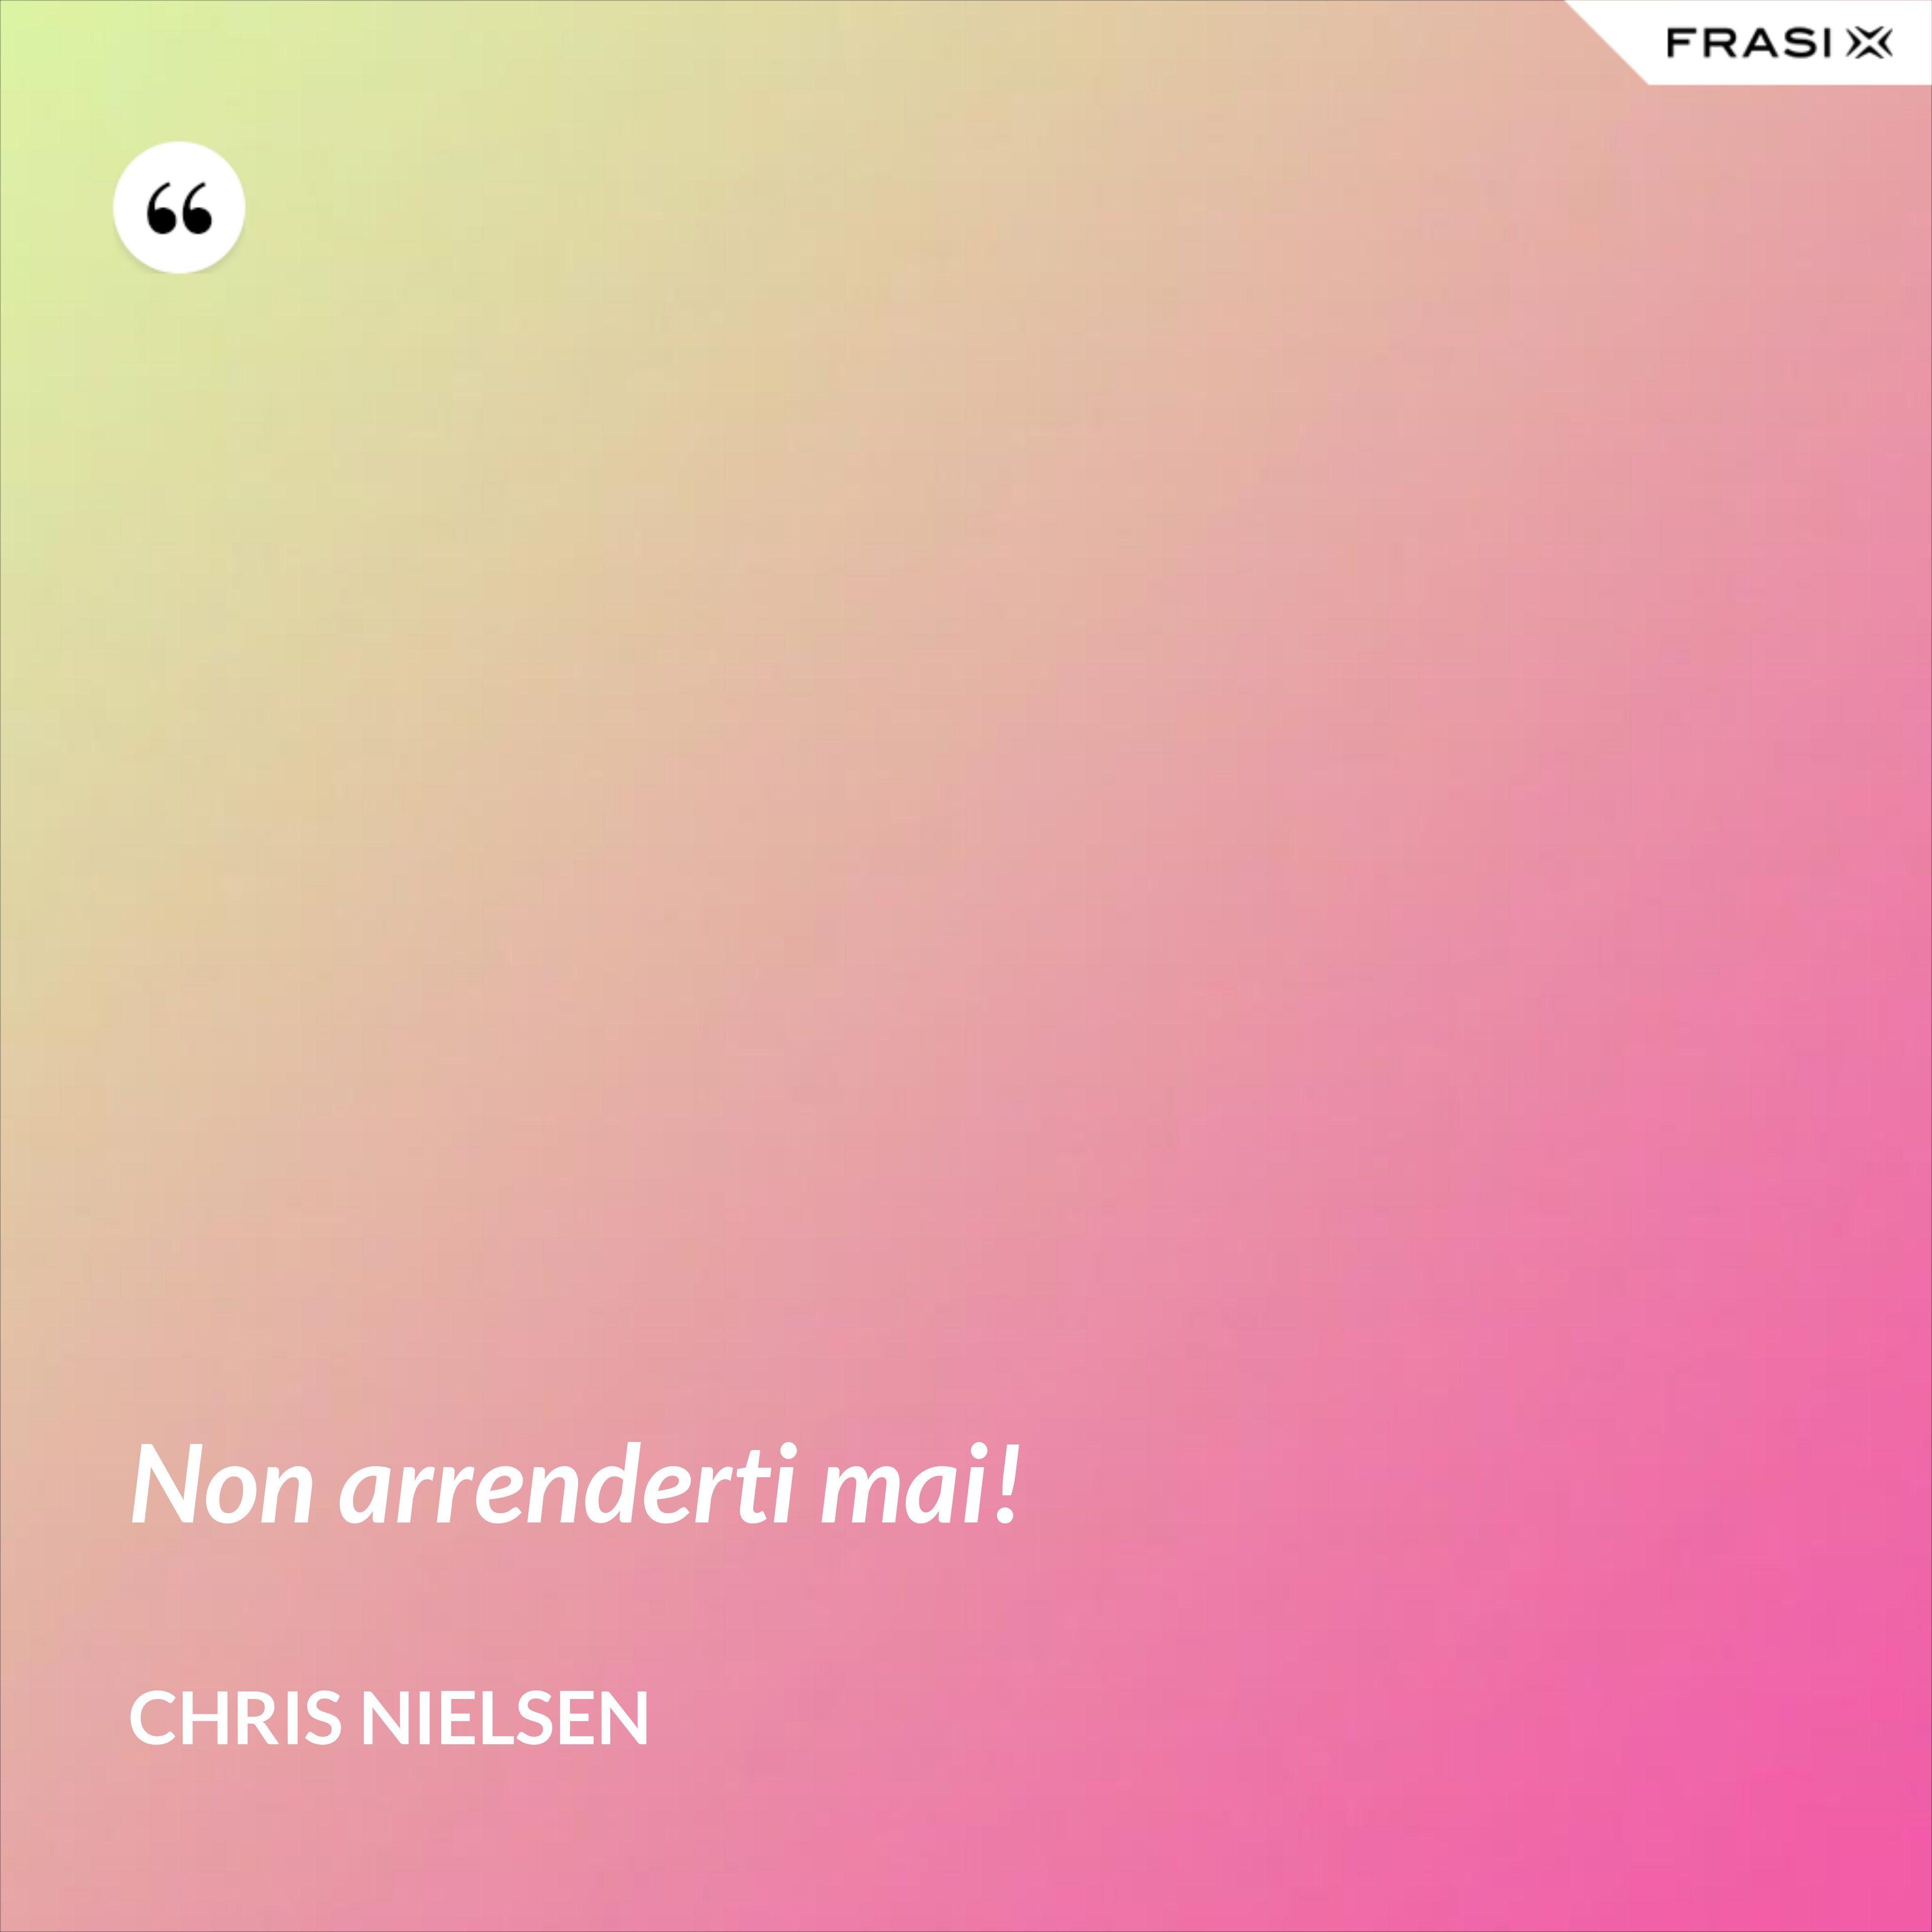 Non arrenderti mai! - Chris Nielsen